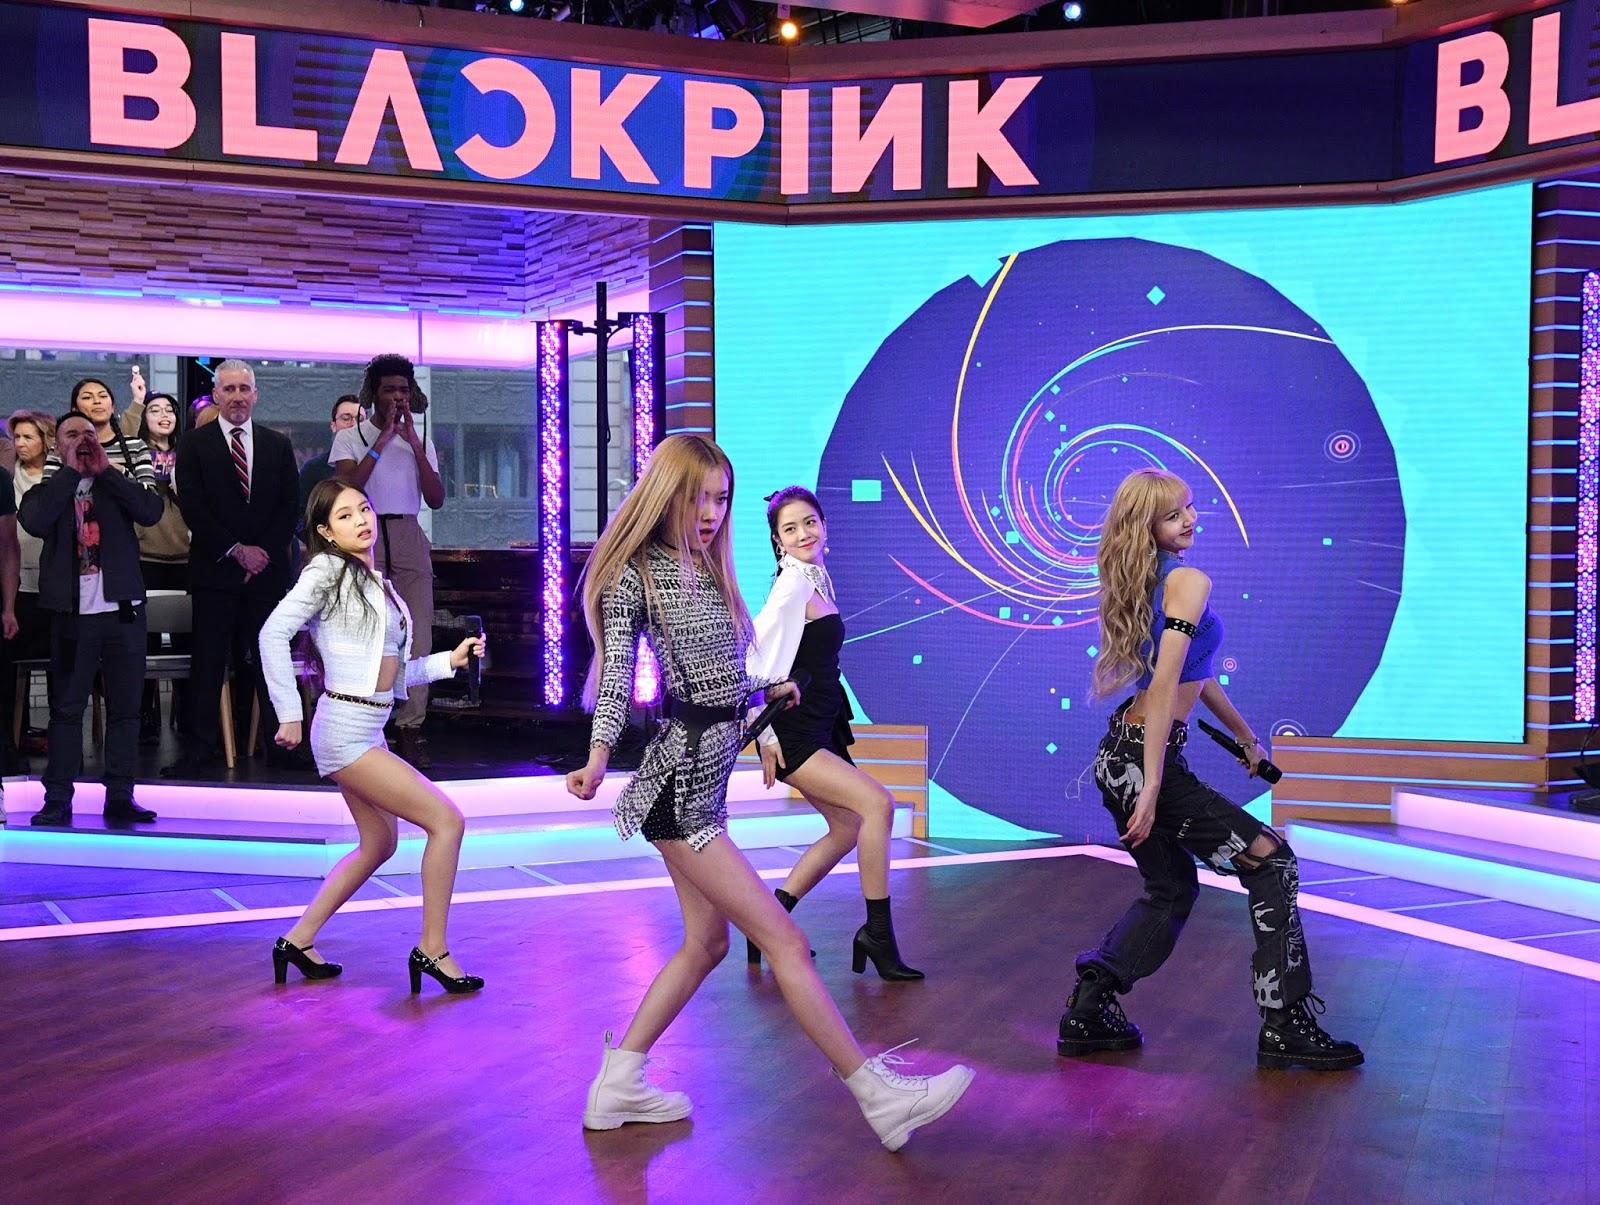 BLACKPINK on Good Morning America - February 12, 2019